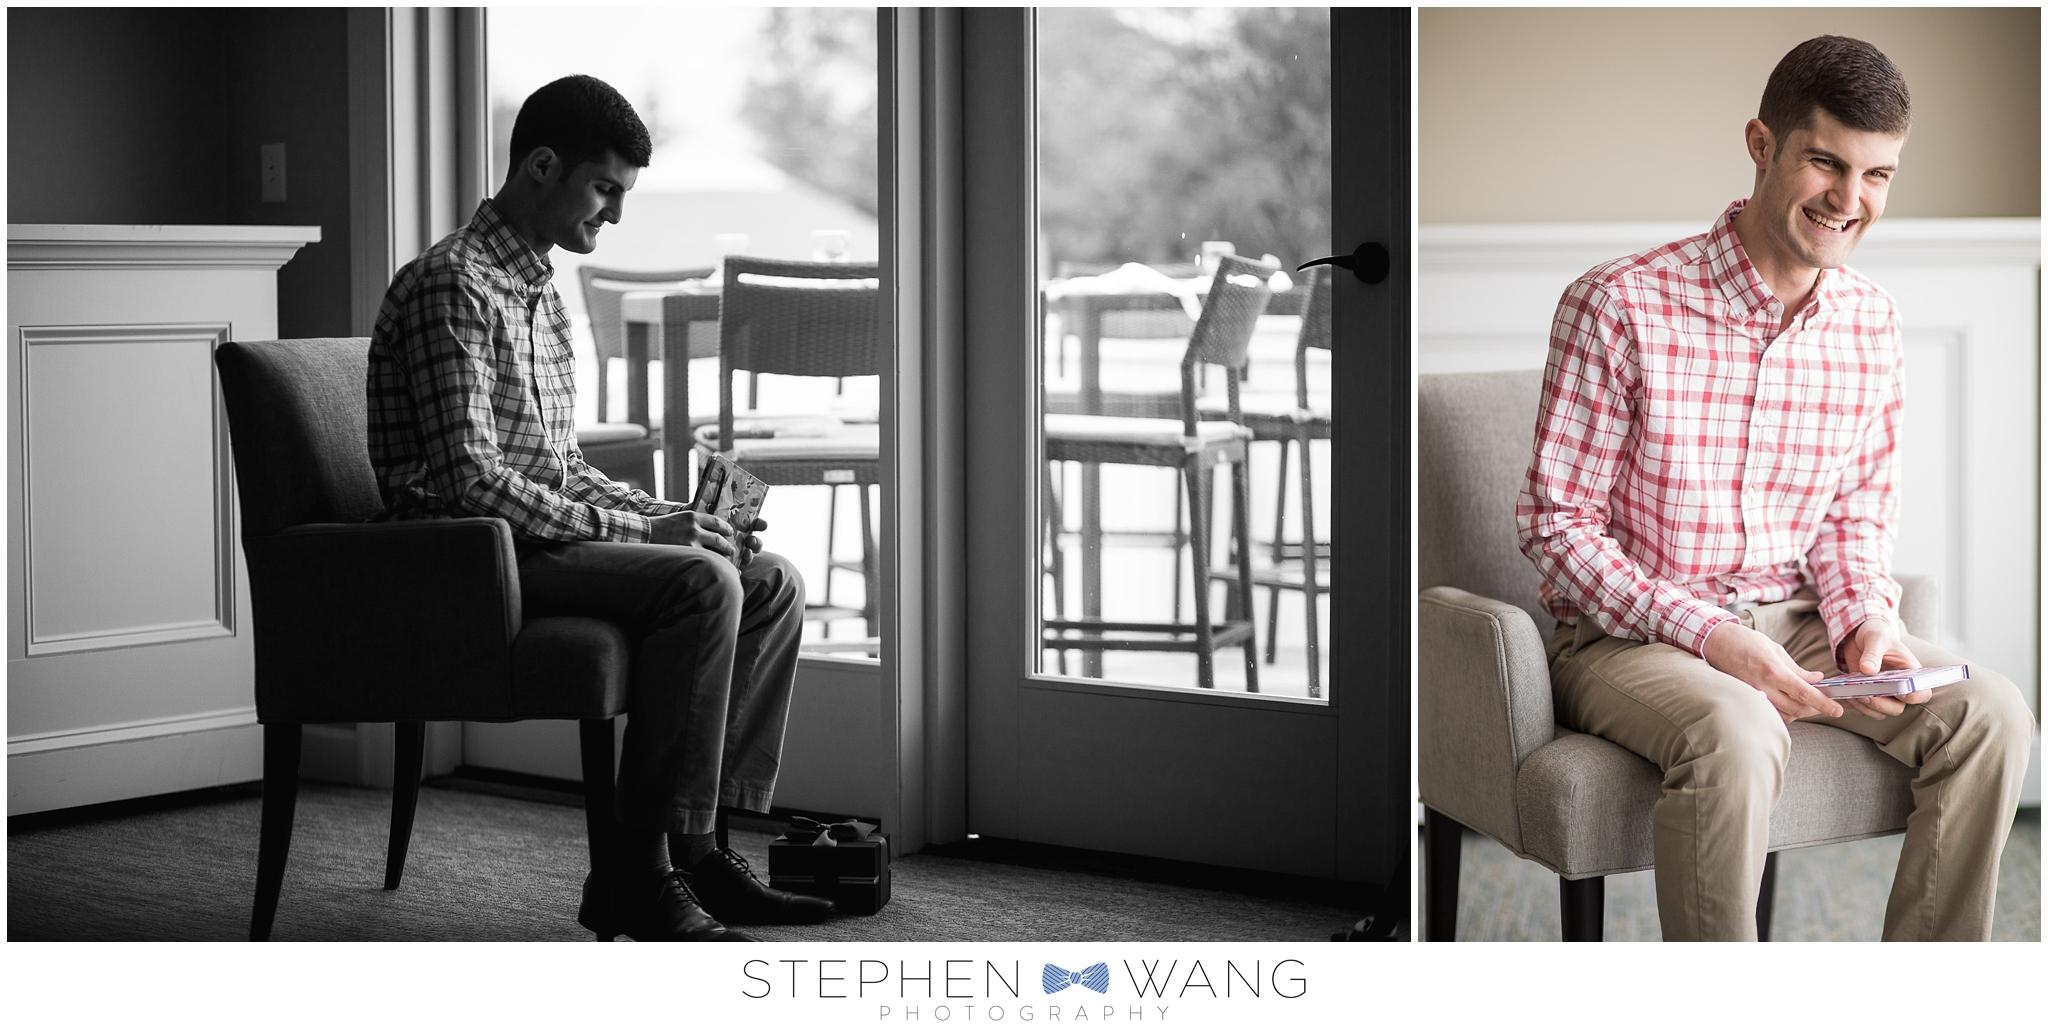 Stephen Wang Photography Shorehaven Norwalk CT Wedding Photographer connecticut shoreline shore haven - 3.jpg